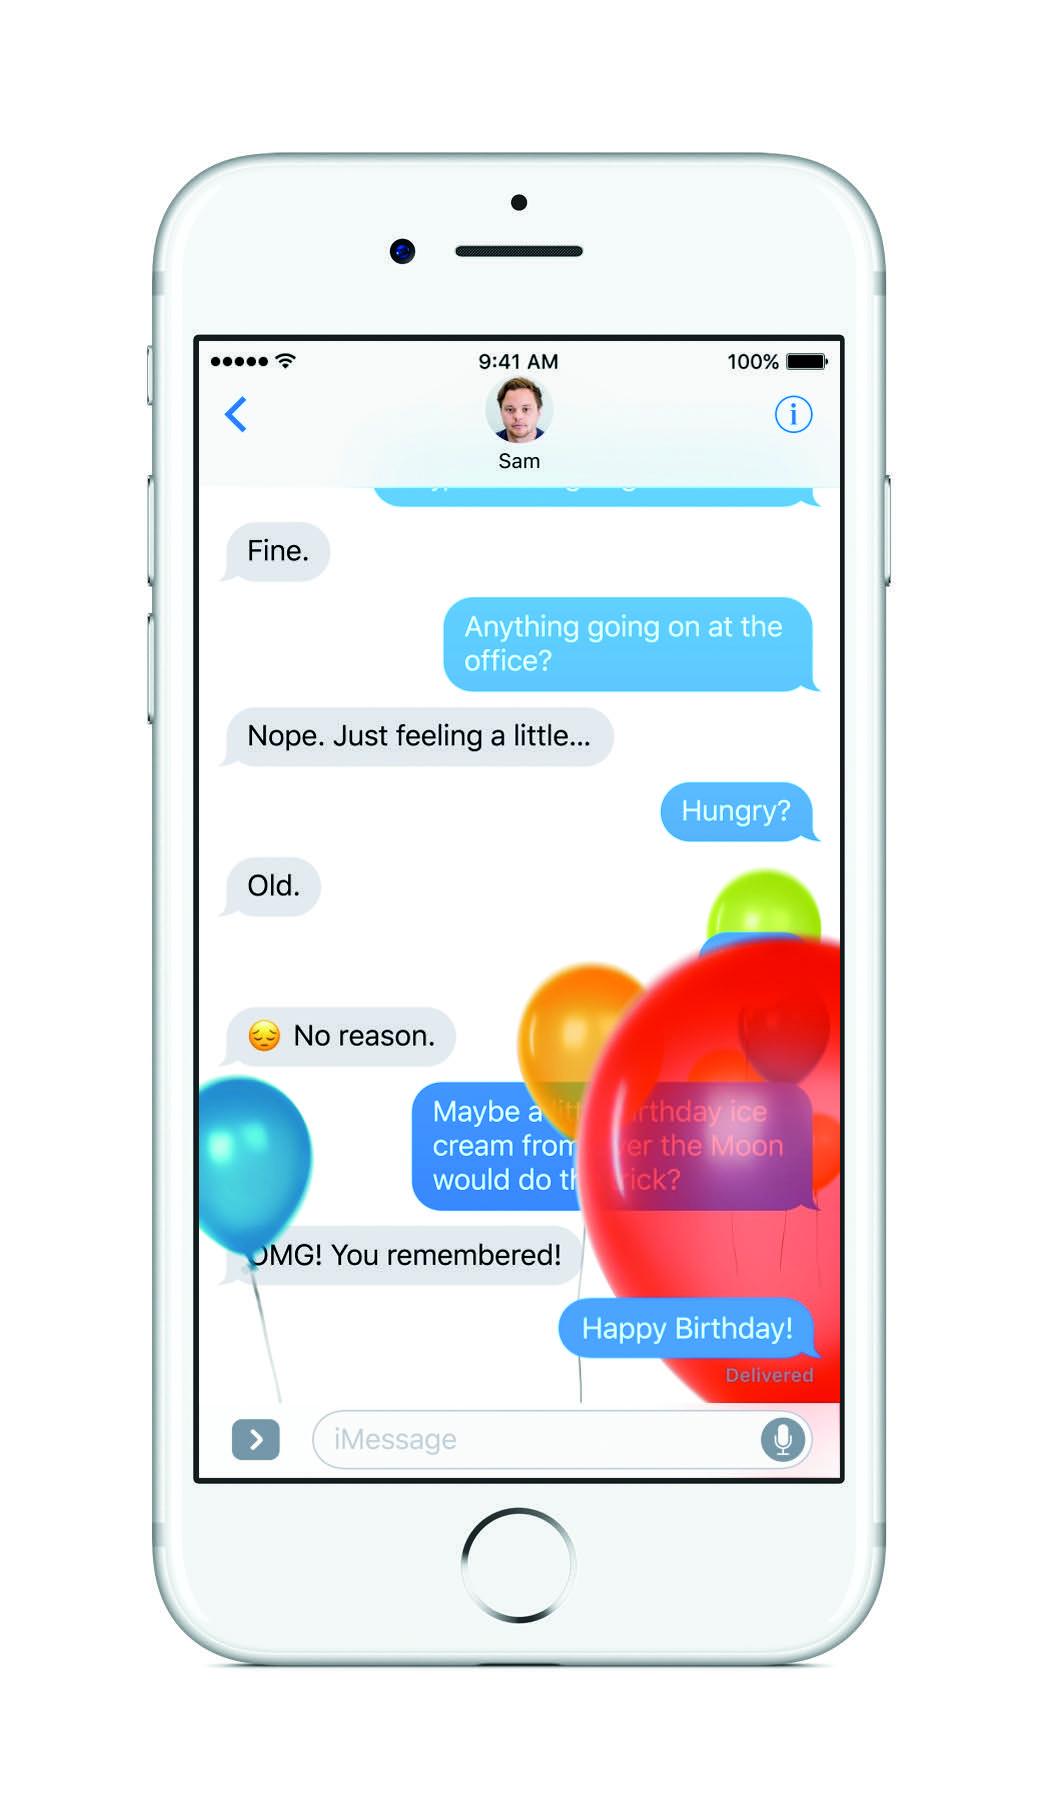 Balloon_celebration_iOS_10.jpg